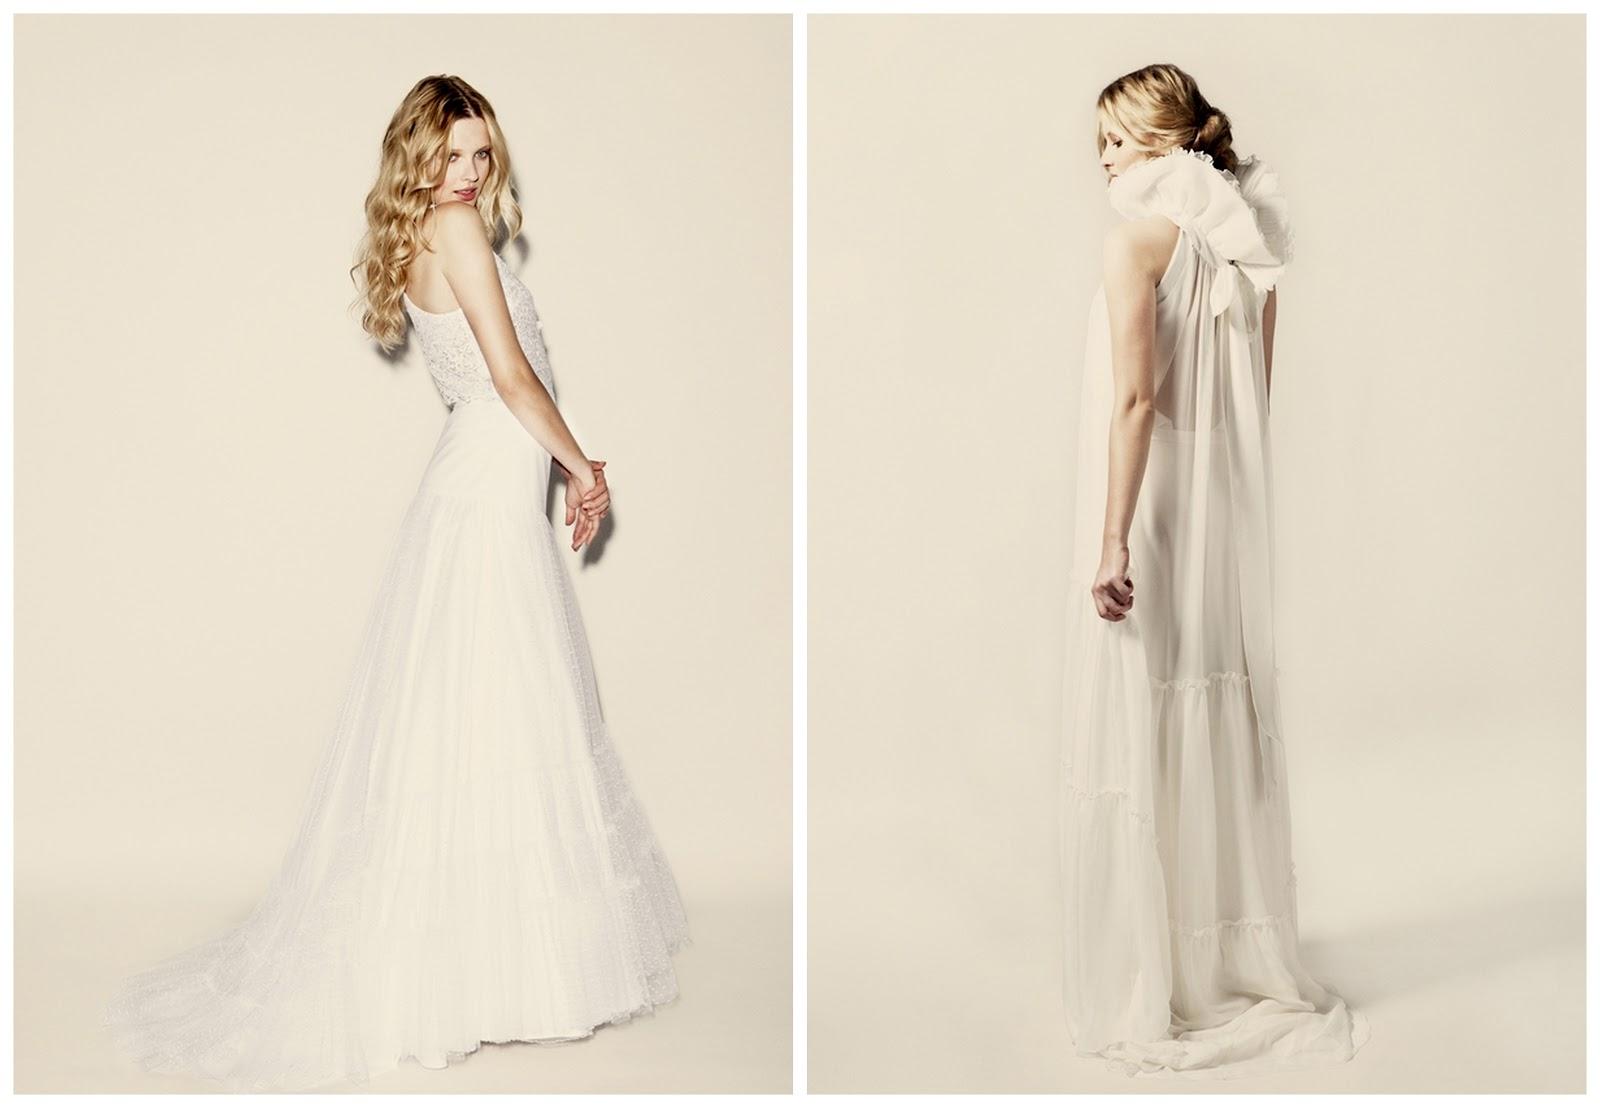 elegant french wedding dresses by delphine manivet